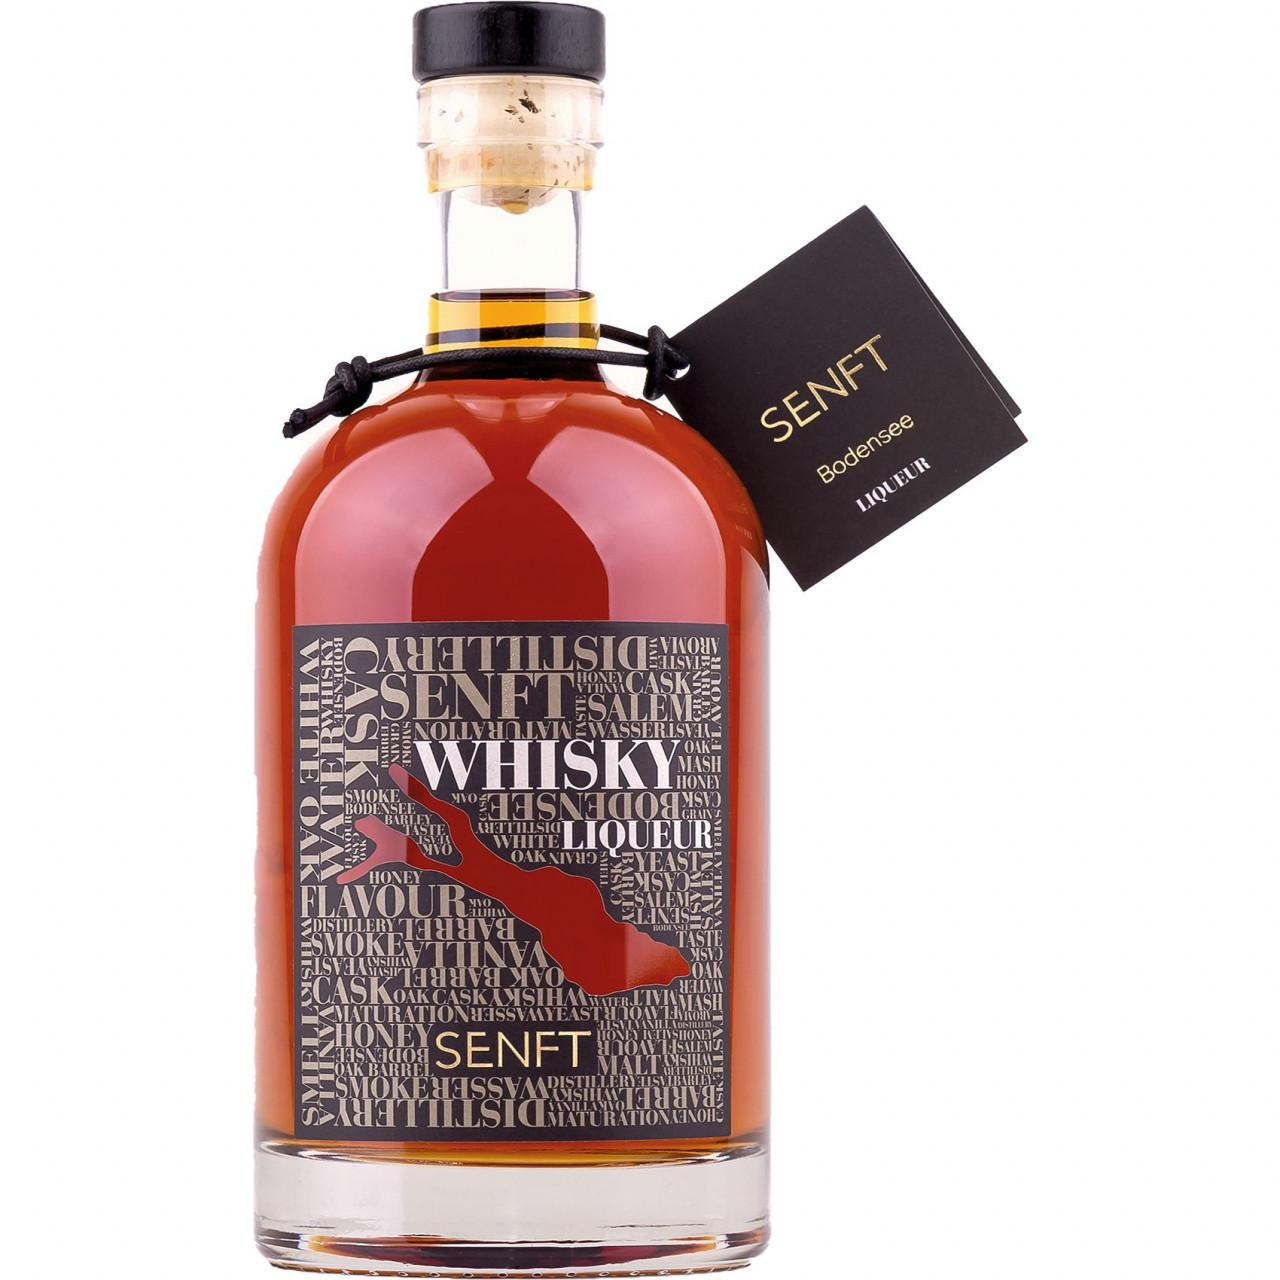 Senft Bodensee-Whisky Liquer 28% 0,7l